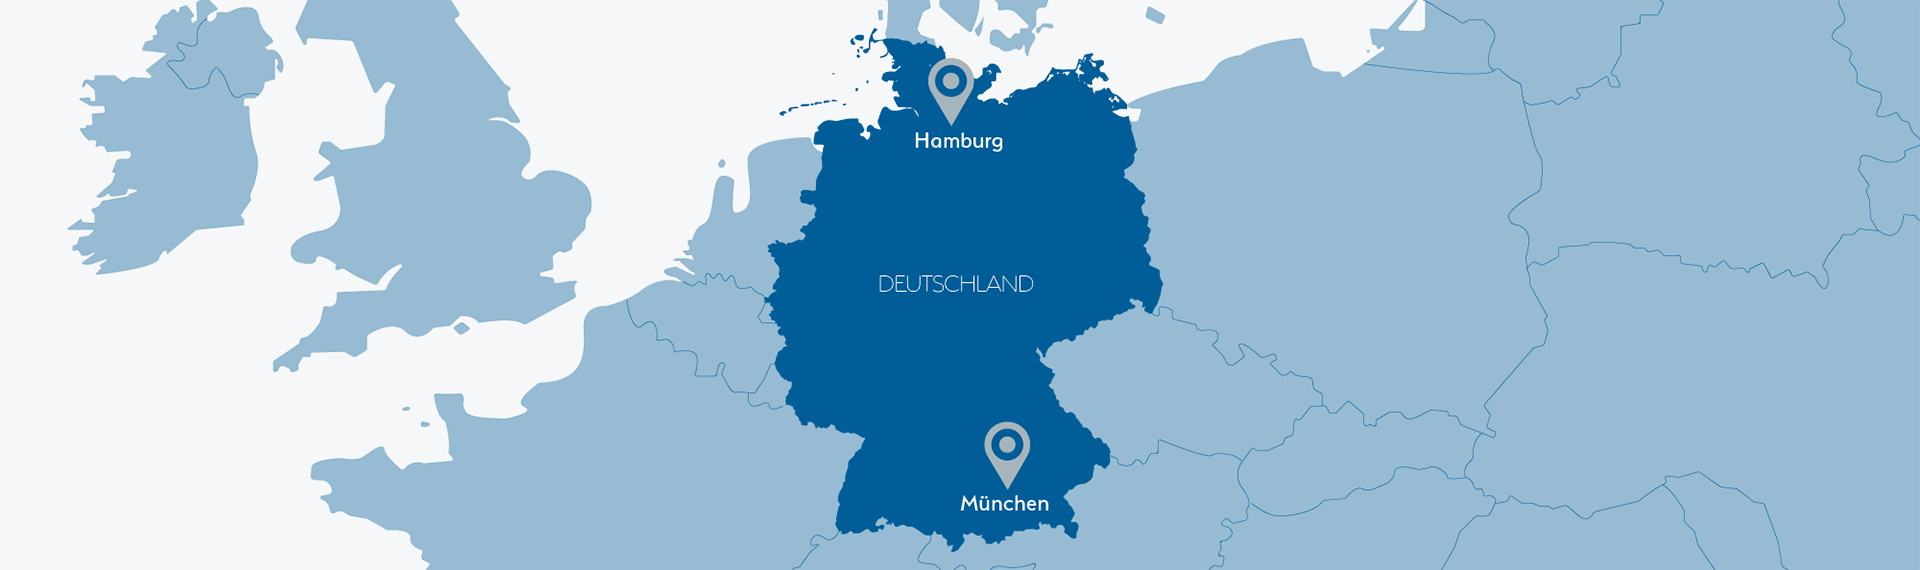 creareal GmbH Hamburg - Kontakt und Standortkarte Creareal